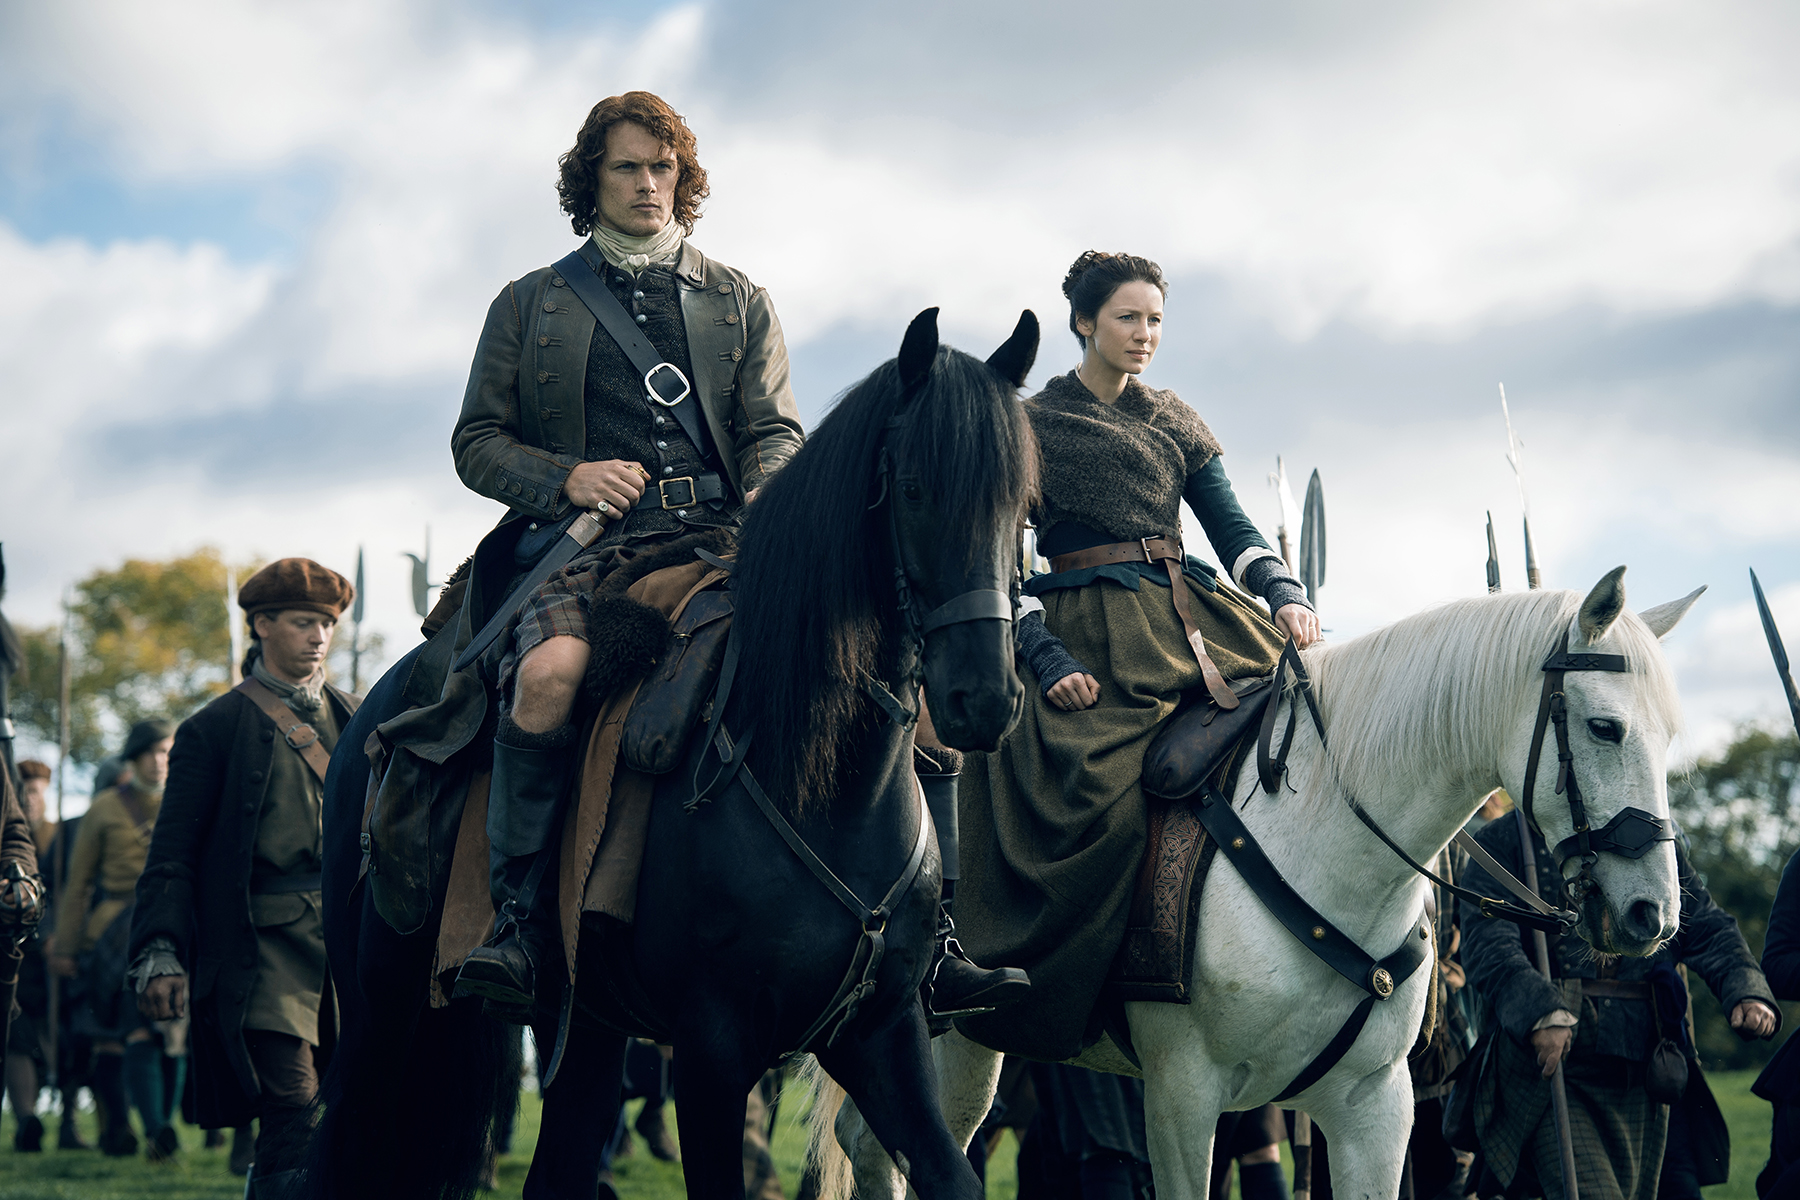 Outlander-Co-Executive-Producer-Matthew-B.-Roberts-Talks-Je-Suis-Prest-Episode